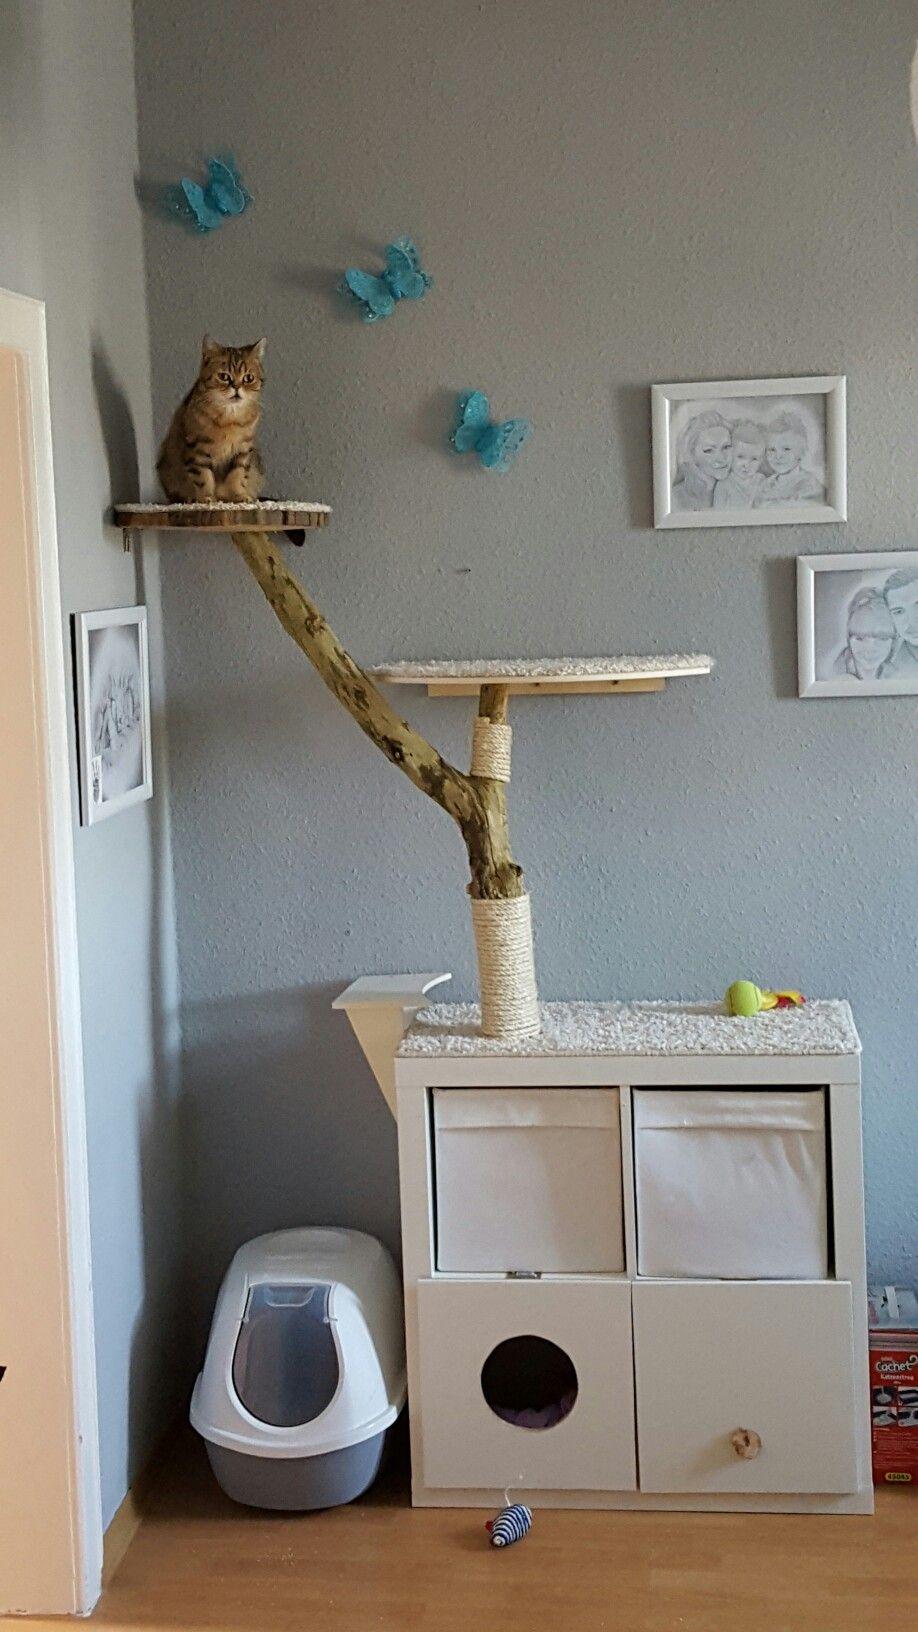 katzen kratzbaum diy selfmade pinterest katzen katzen zubeh r und katzen haus. Black Bedroom Furniture Sets. Home Design Ideas